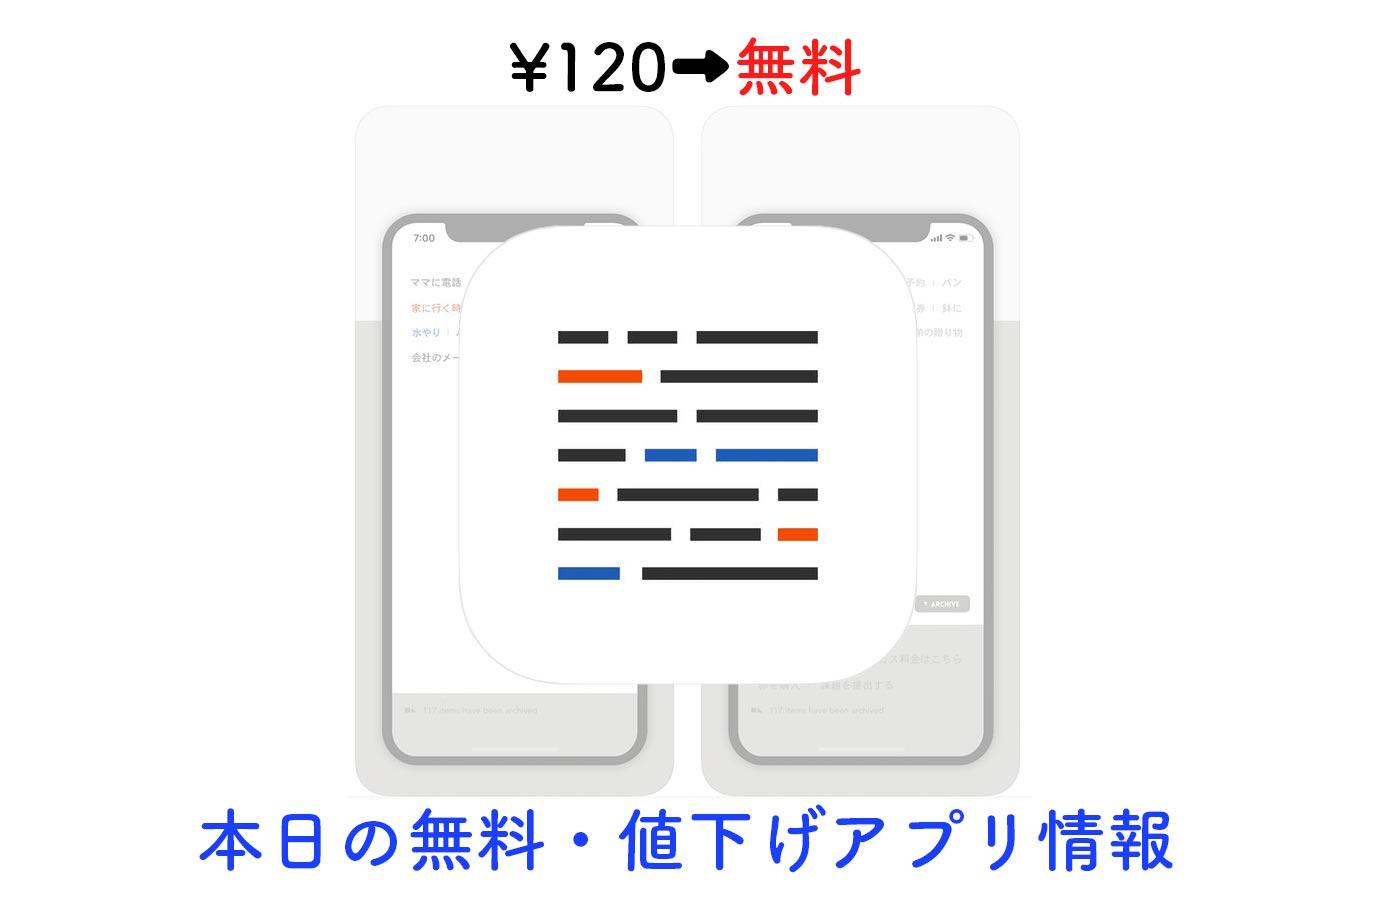 Appsale0510